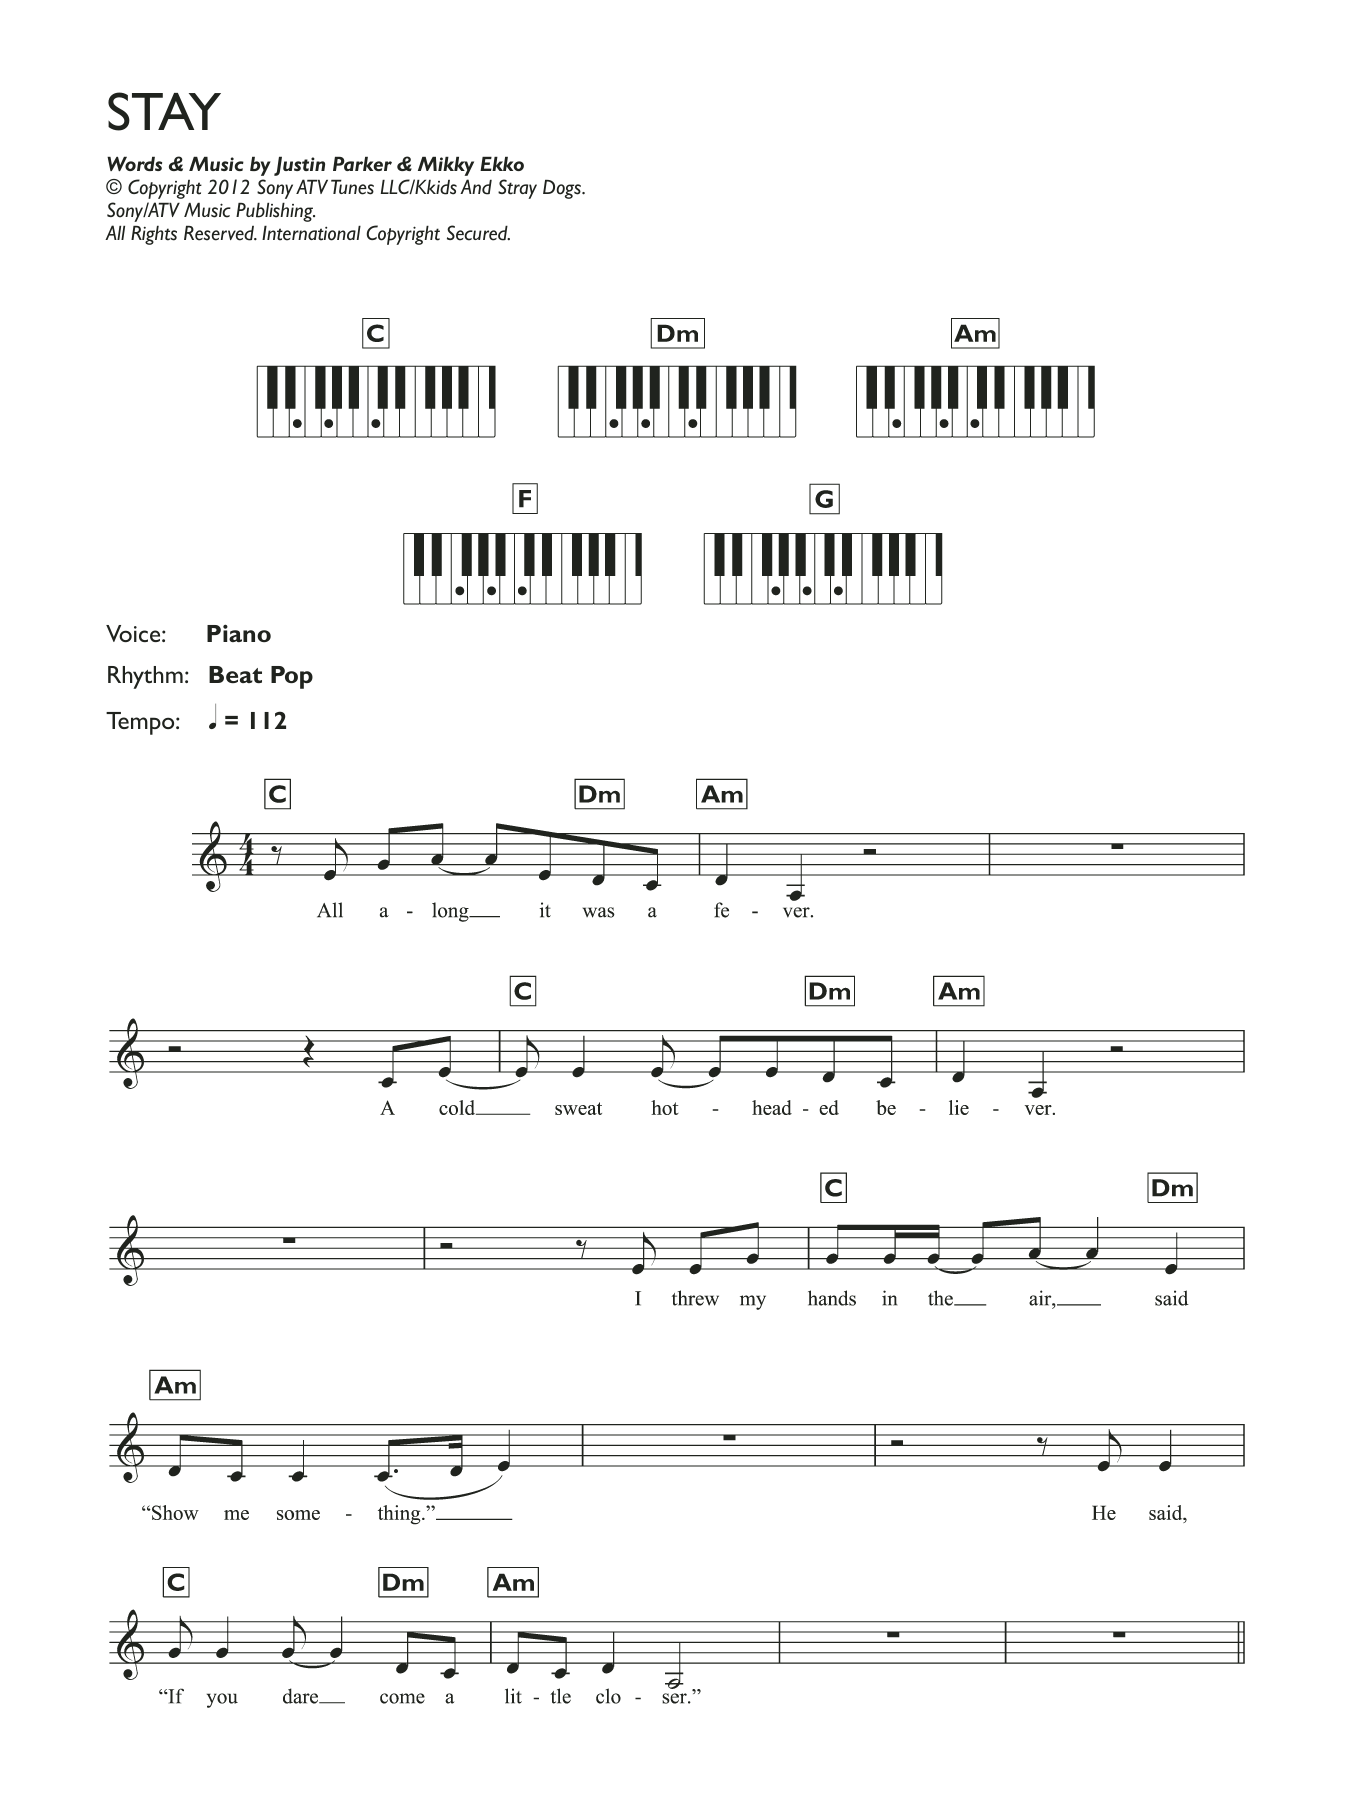 Stay Sheet Music   Rihanna   Piano Chords/Lyrics